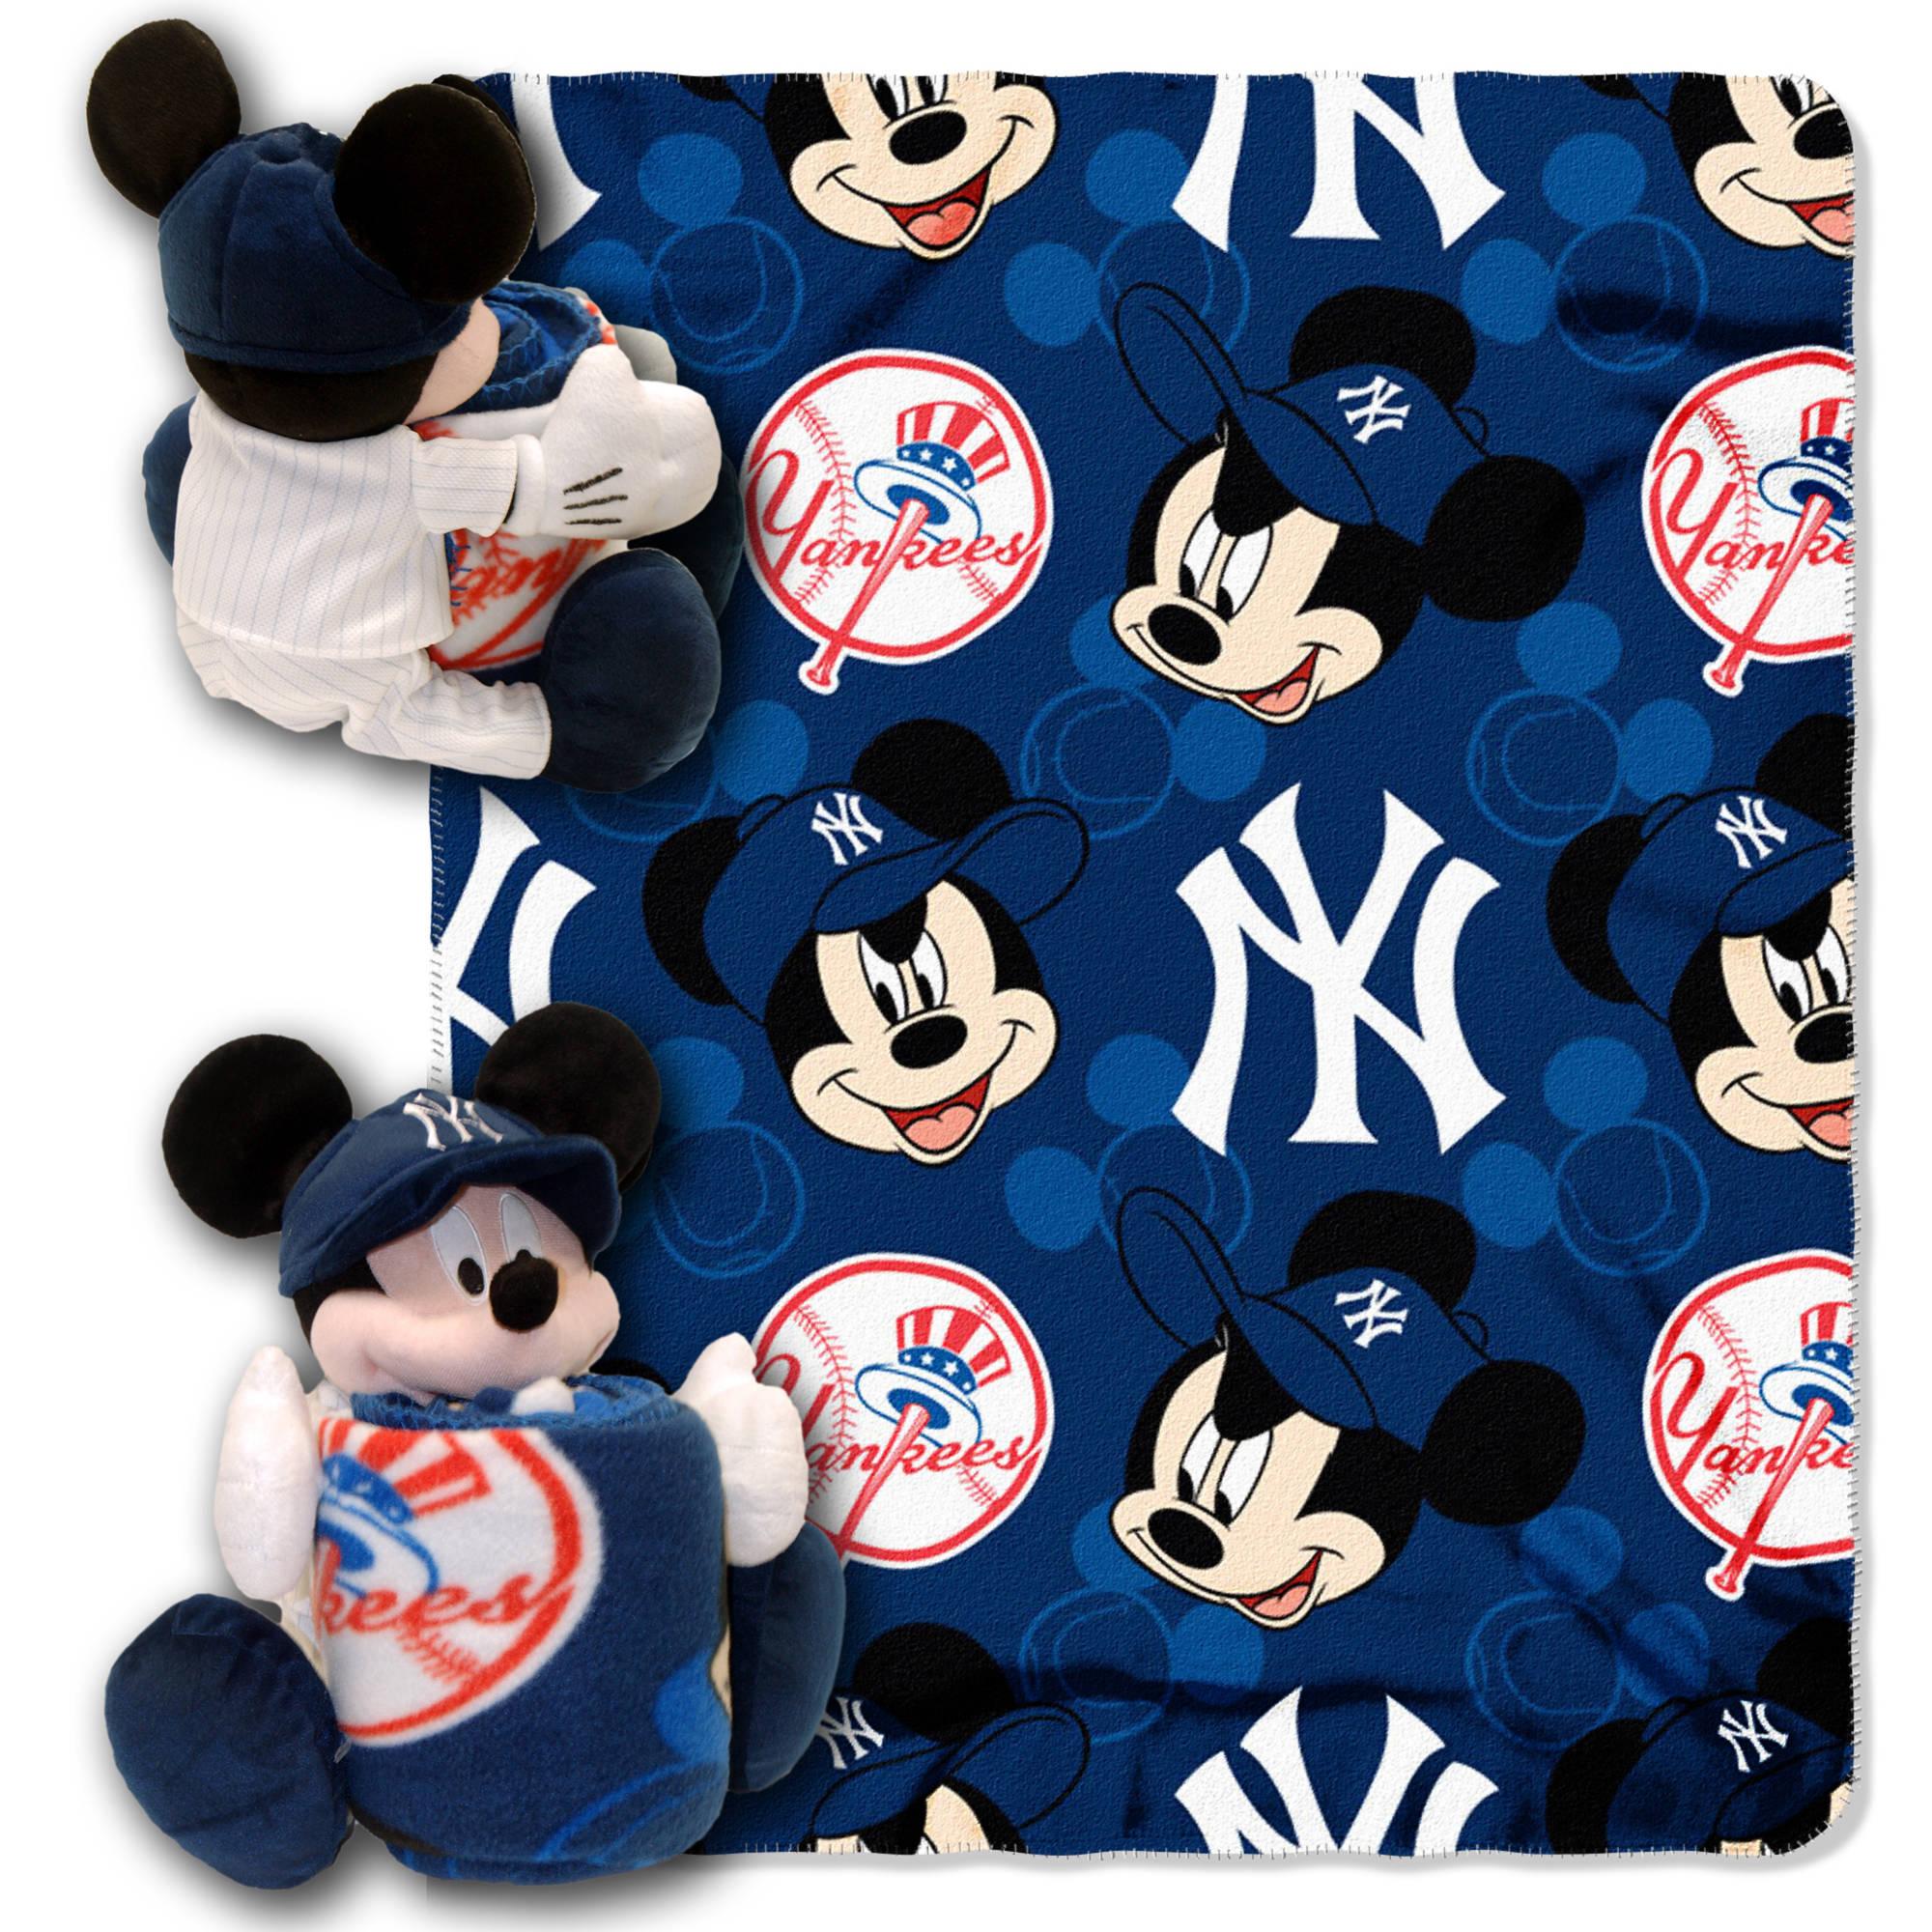 "Disney MLB New York Yankees Pitch Crazy Hugger Pillow and 40"" x 50"" Throw Set"